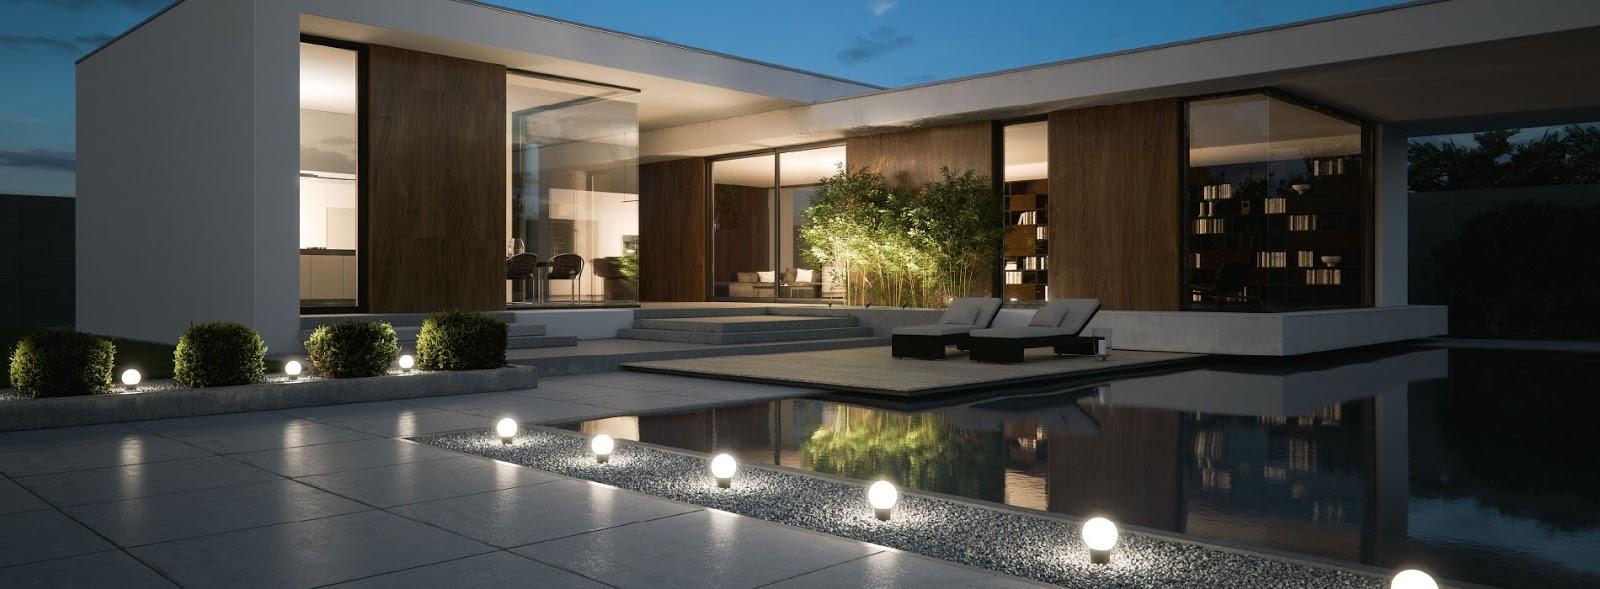 Lledo group feel the light iluminaci n para la casa y for Iluminacion exterior jardin diseno